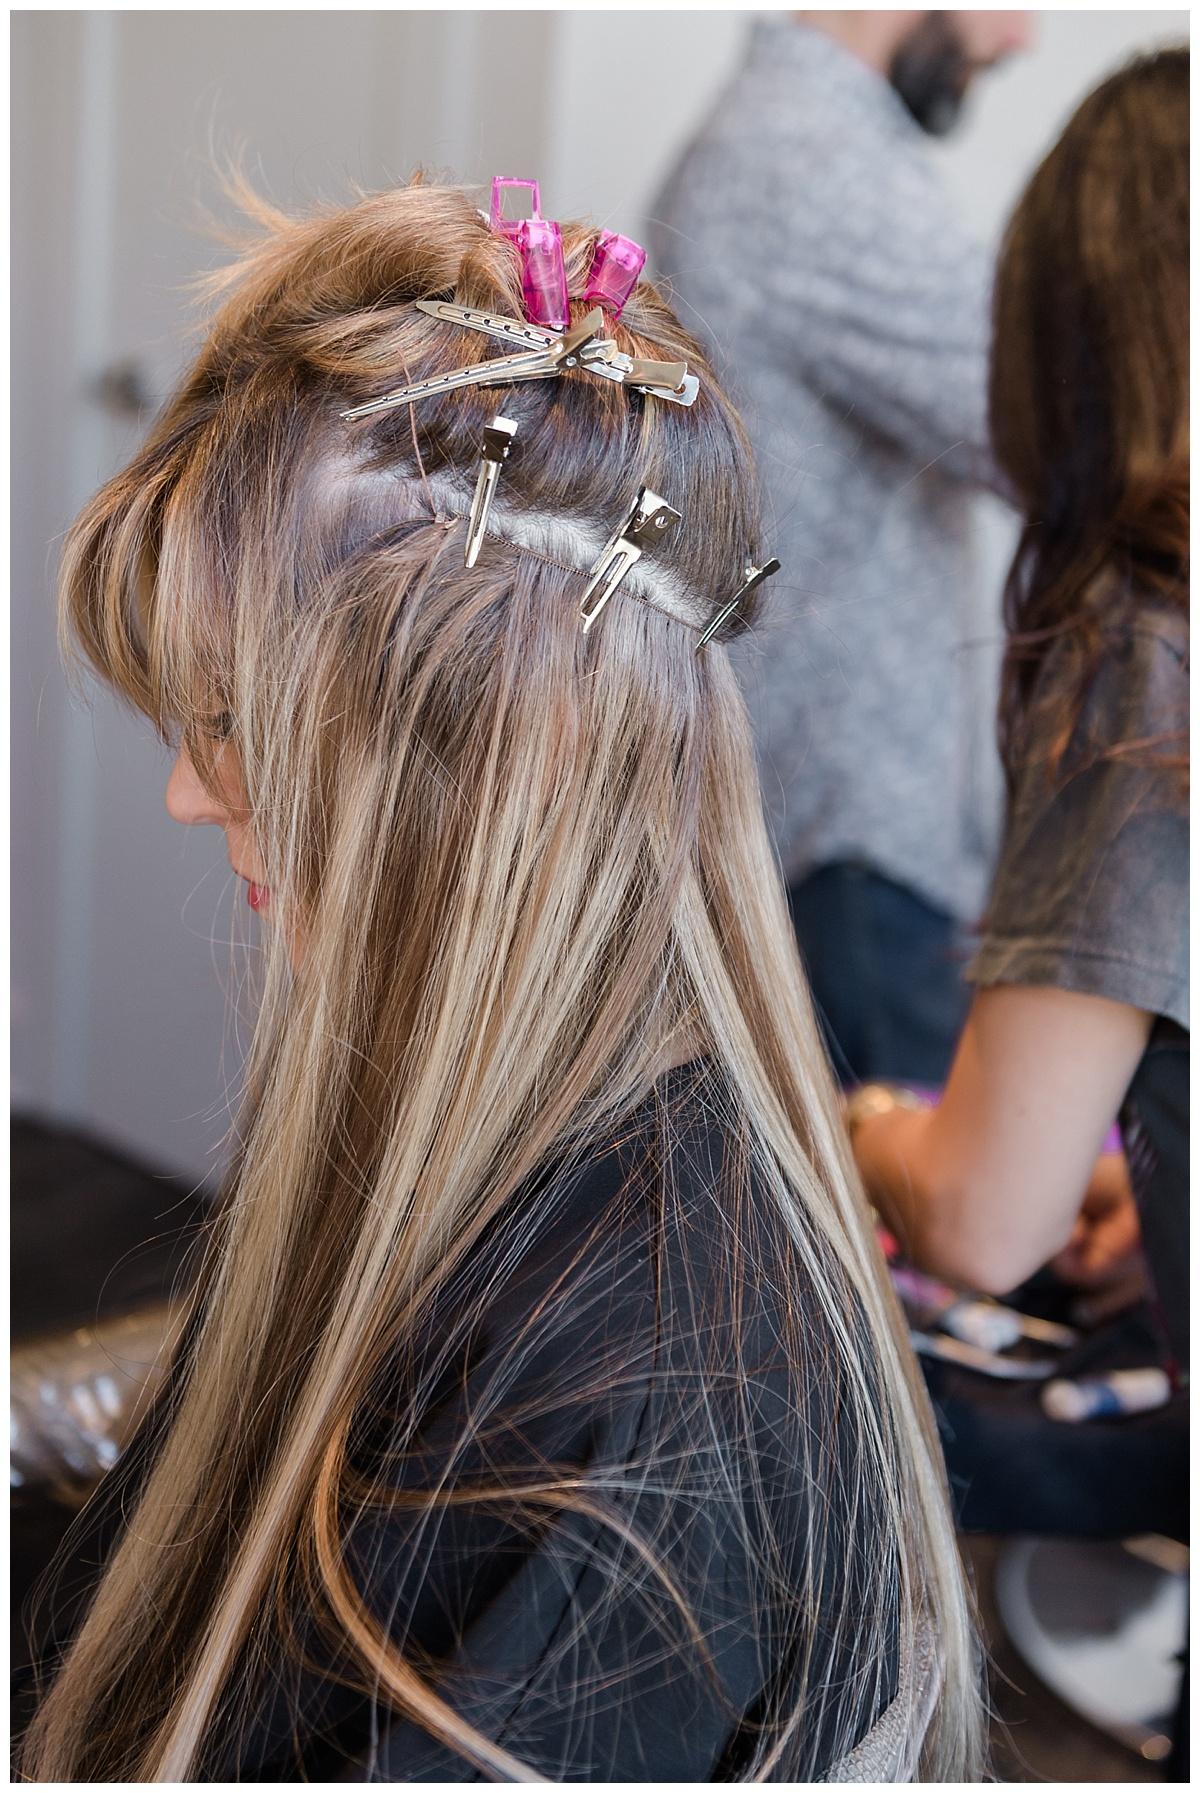 NBD-Hair Extensions_0765.jpg